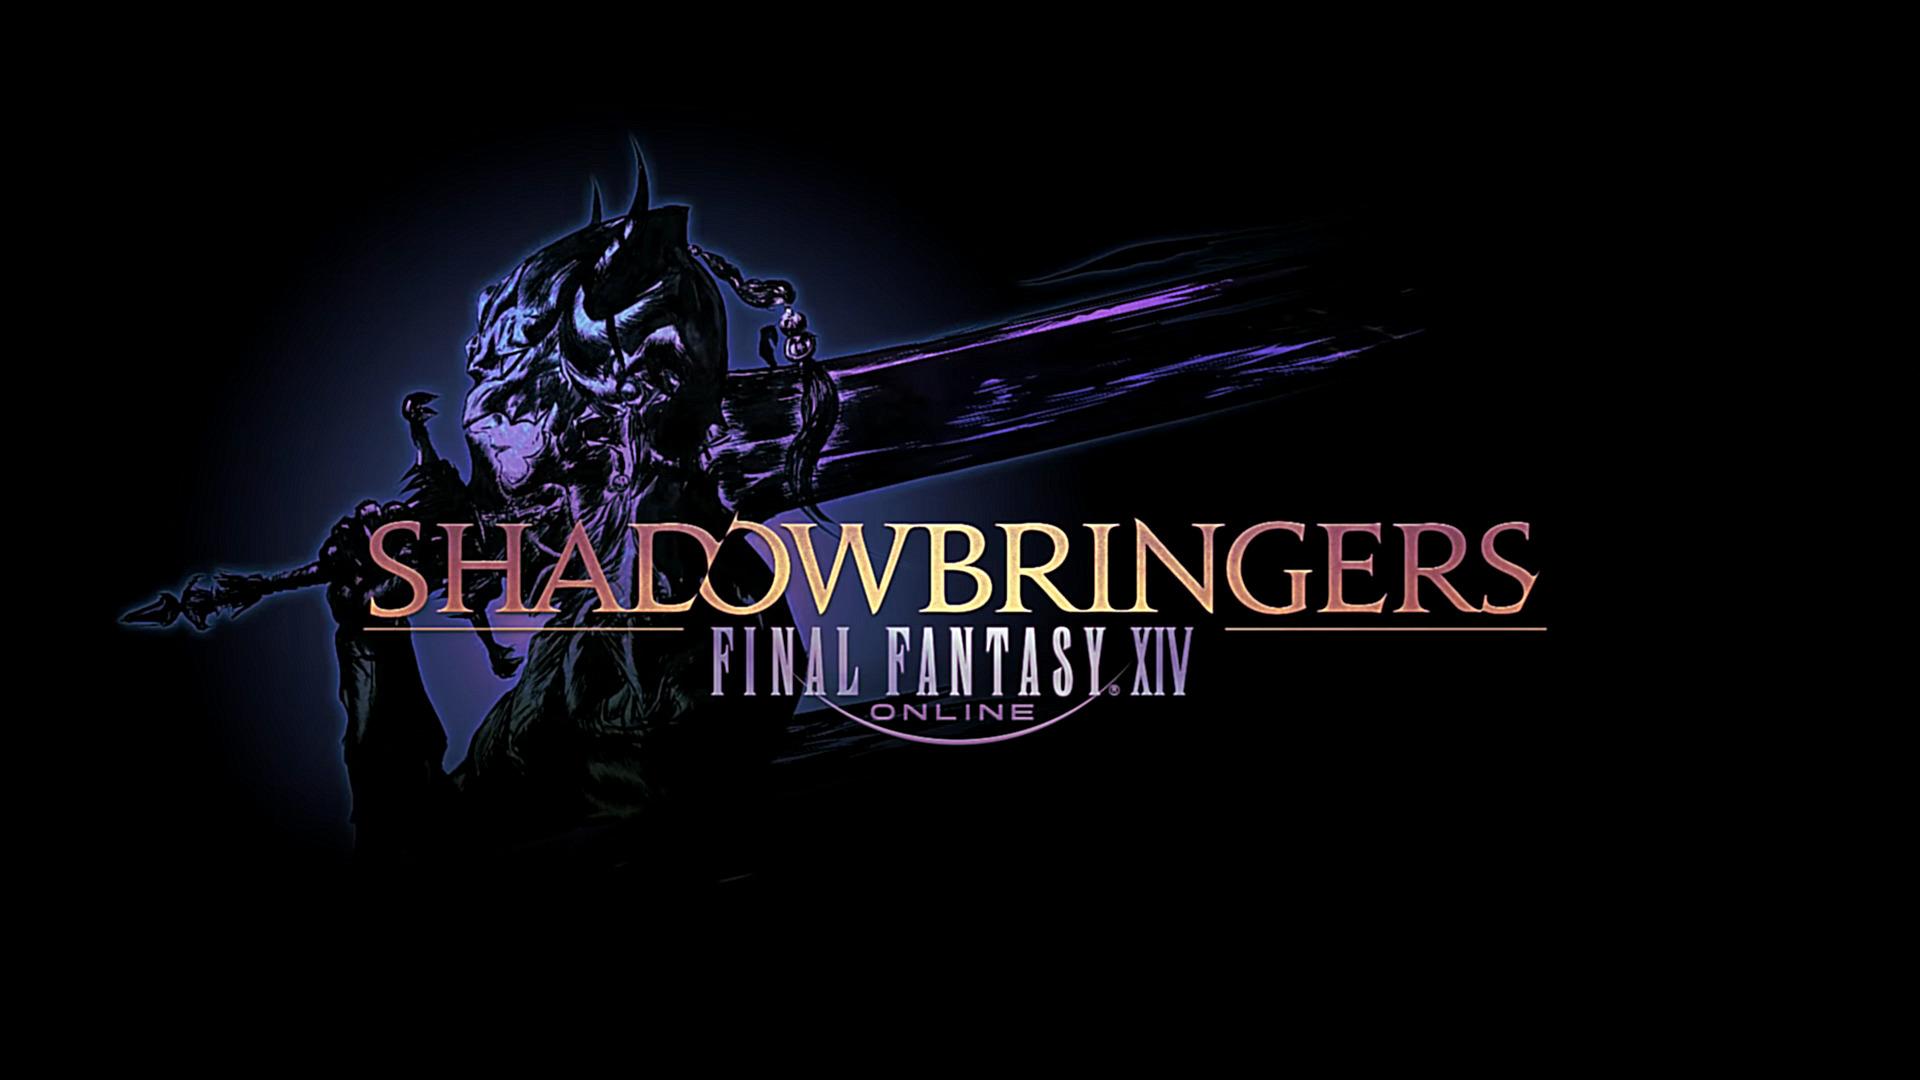 Final Fantasy XIV Shadowbringers Episode One: Telling a Tale